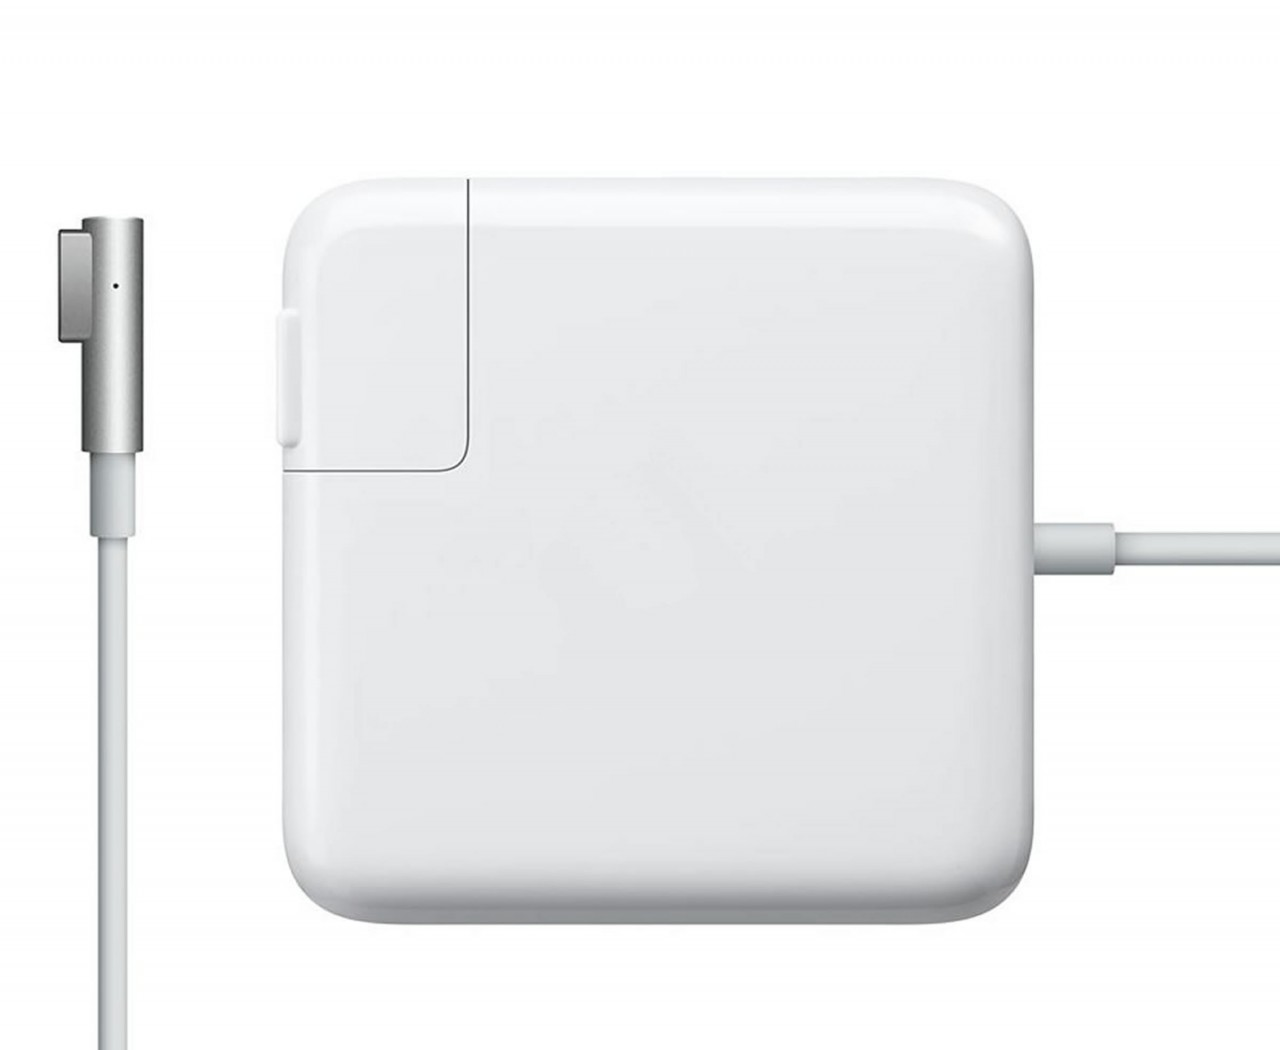 Incarcator Apple MacBook 13.3 inch MA701LL A imagine powerlaptop.ro 2021